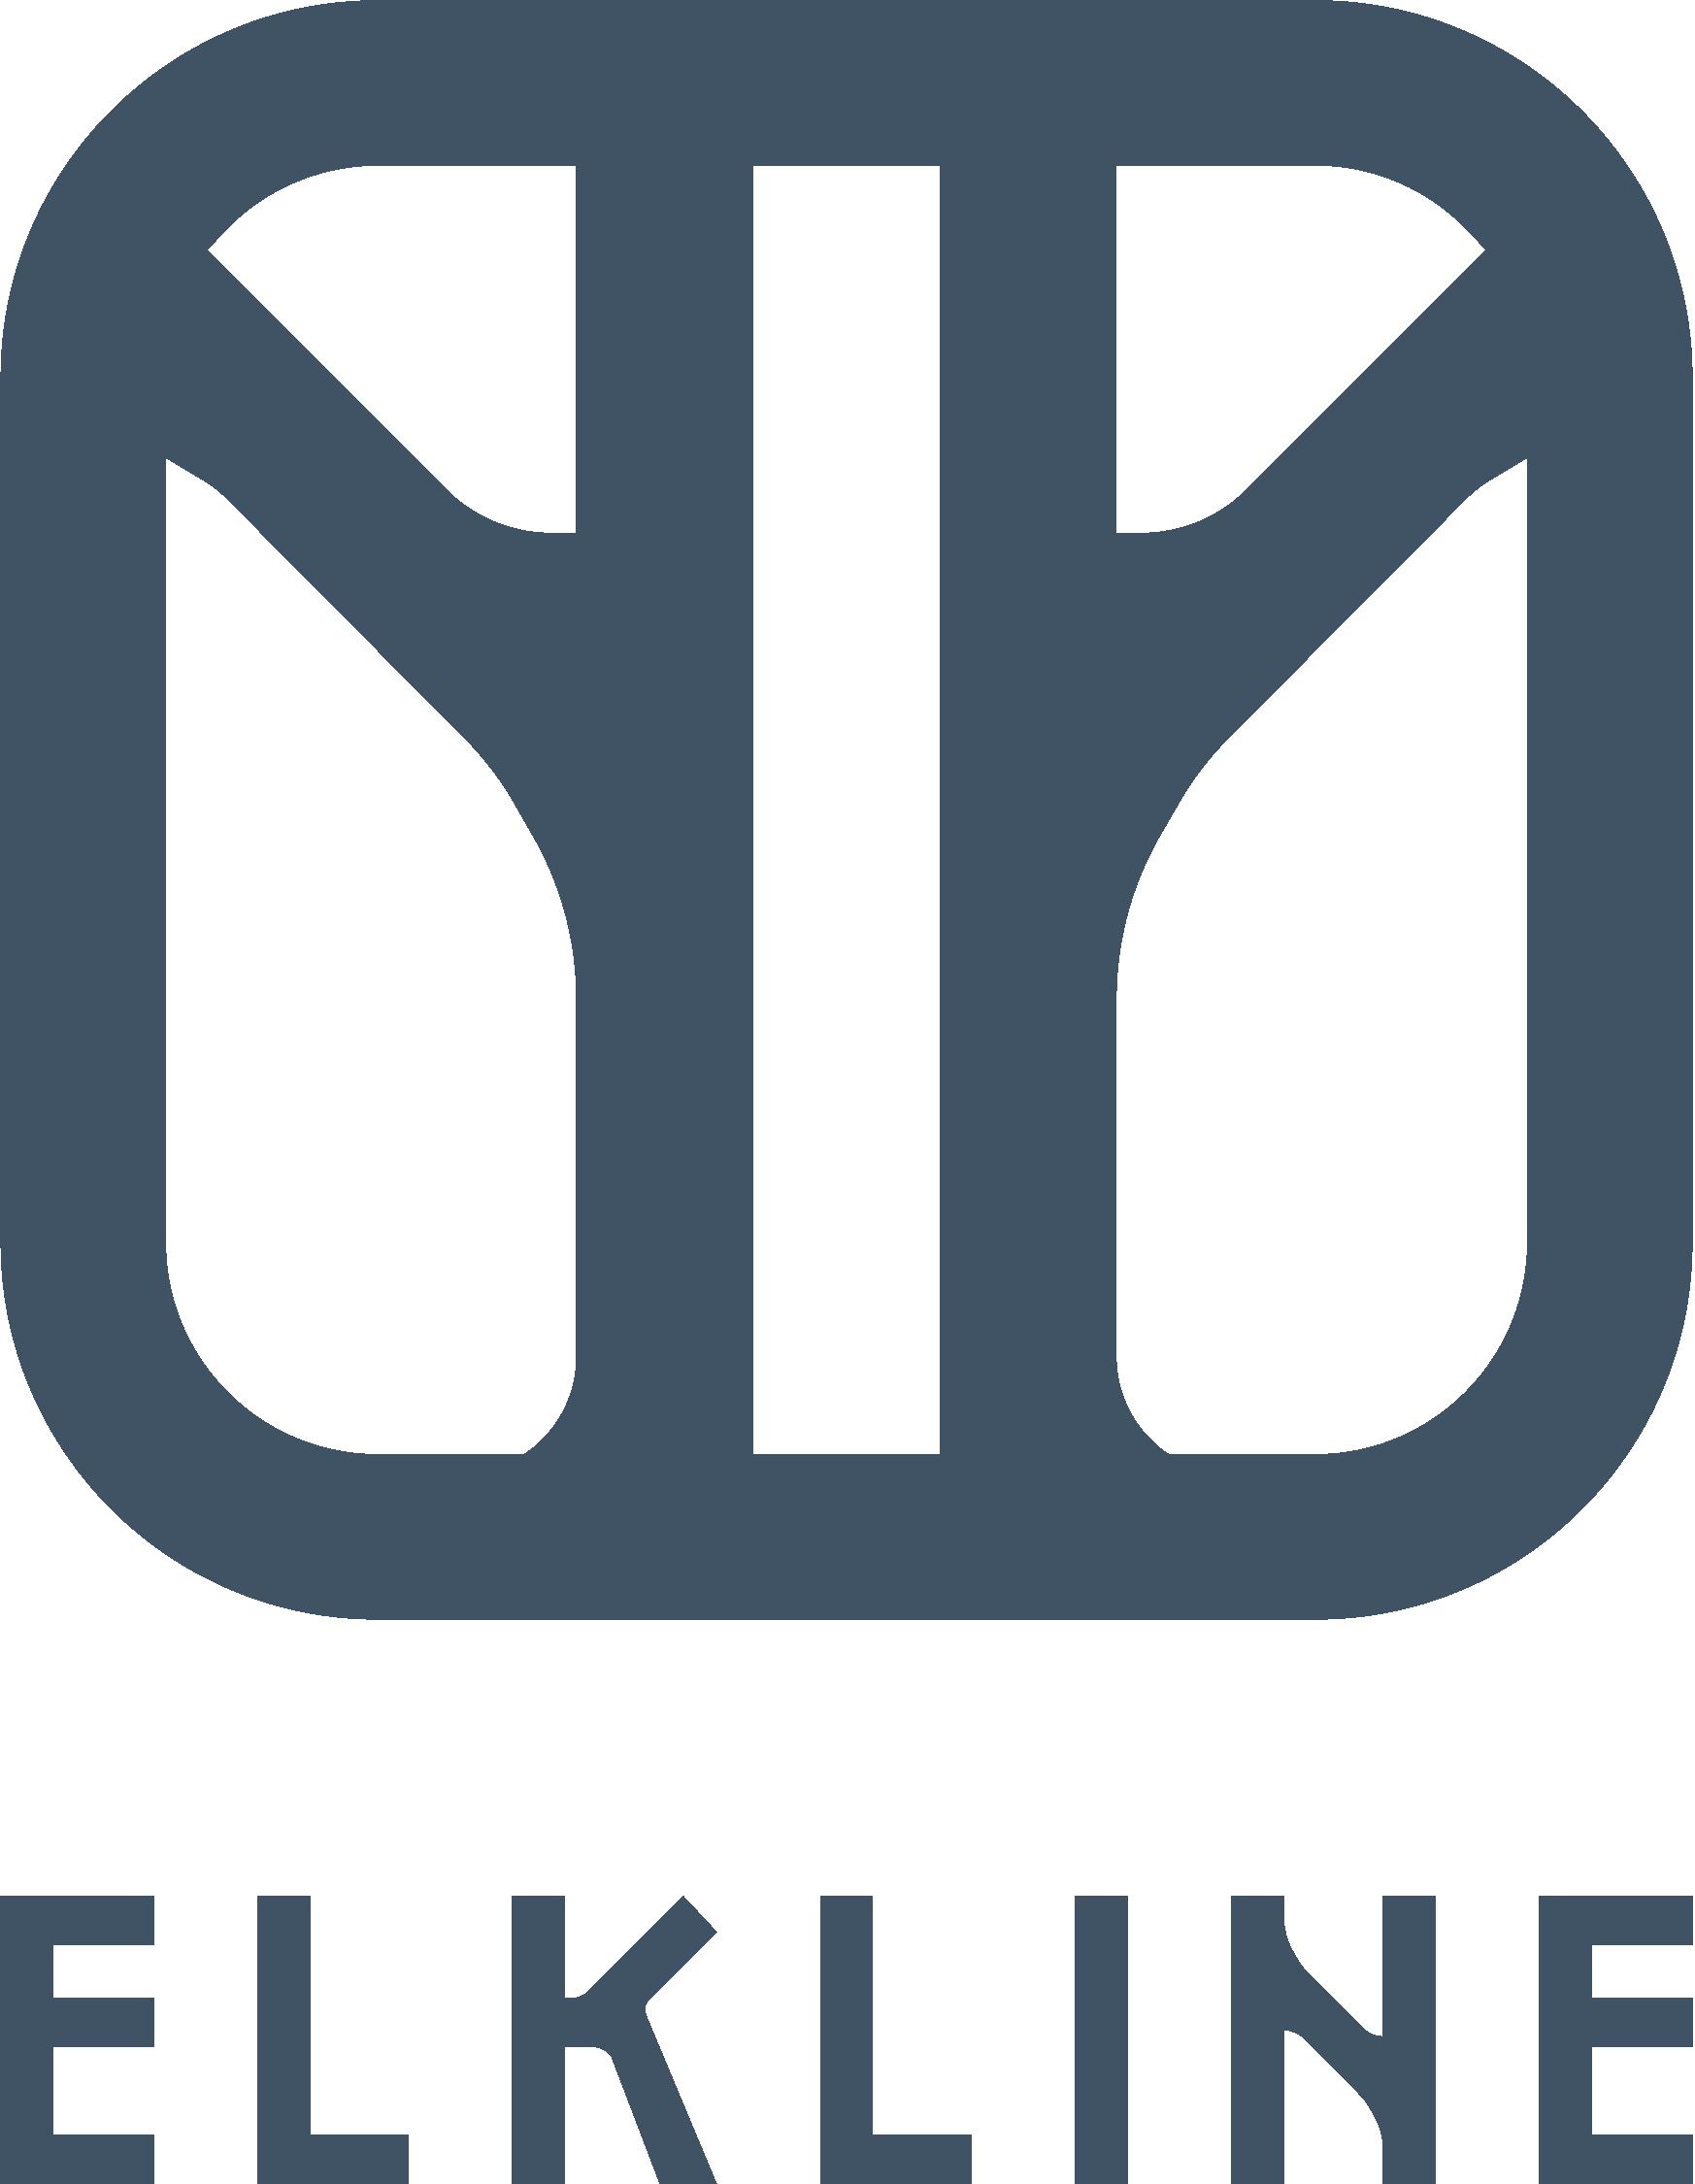 Elkline brand logo